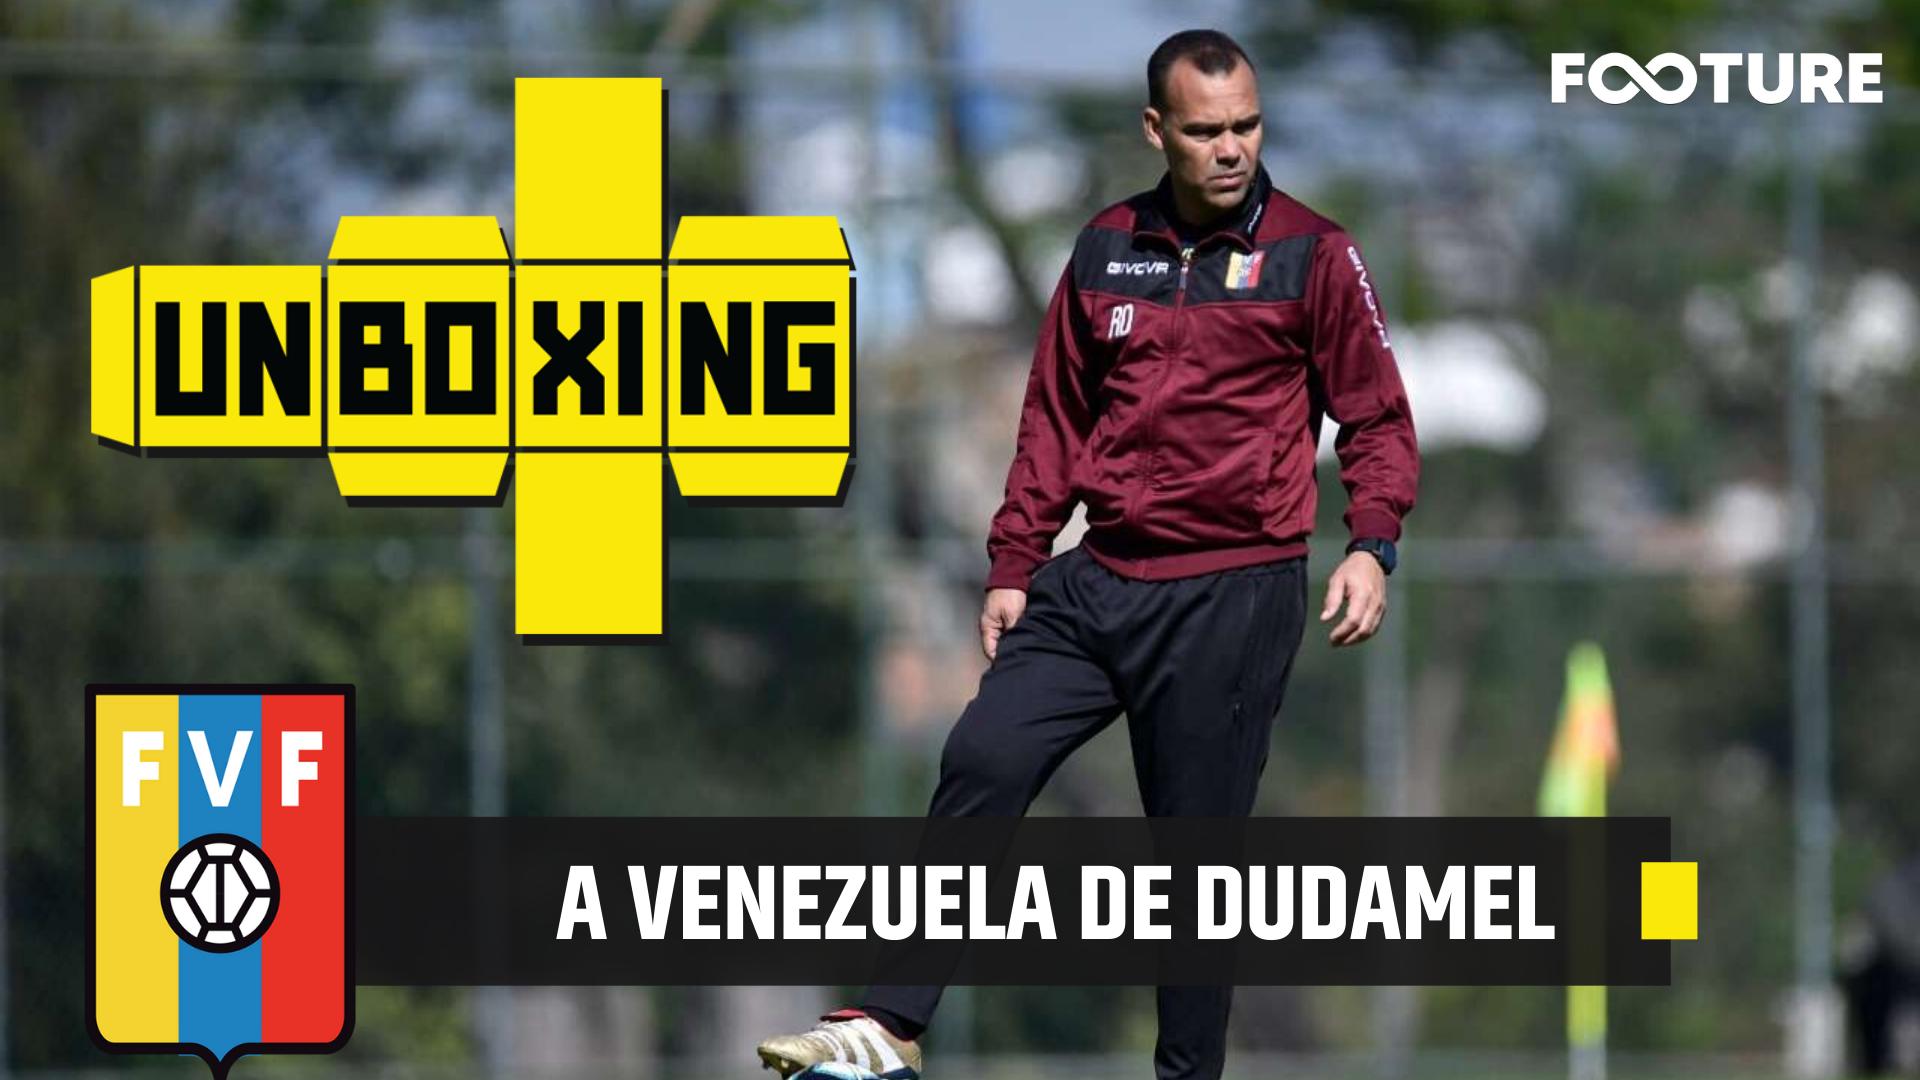 Unboxing #24 – A Venezuela de Rafael Dudamel